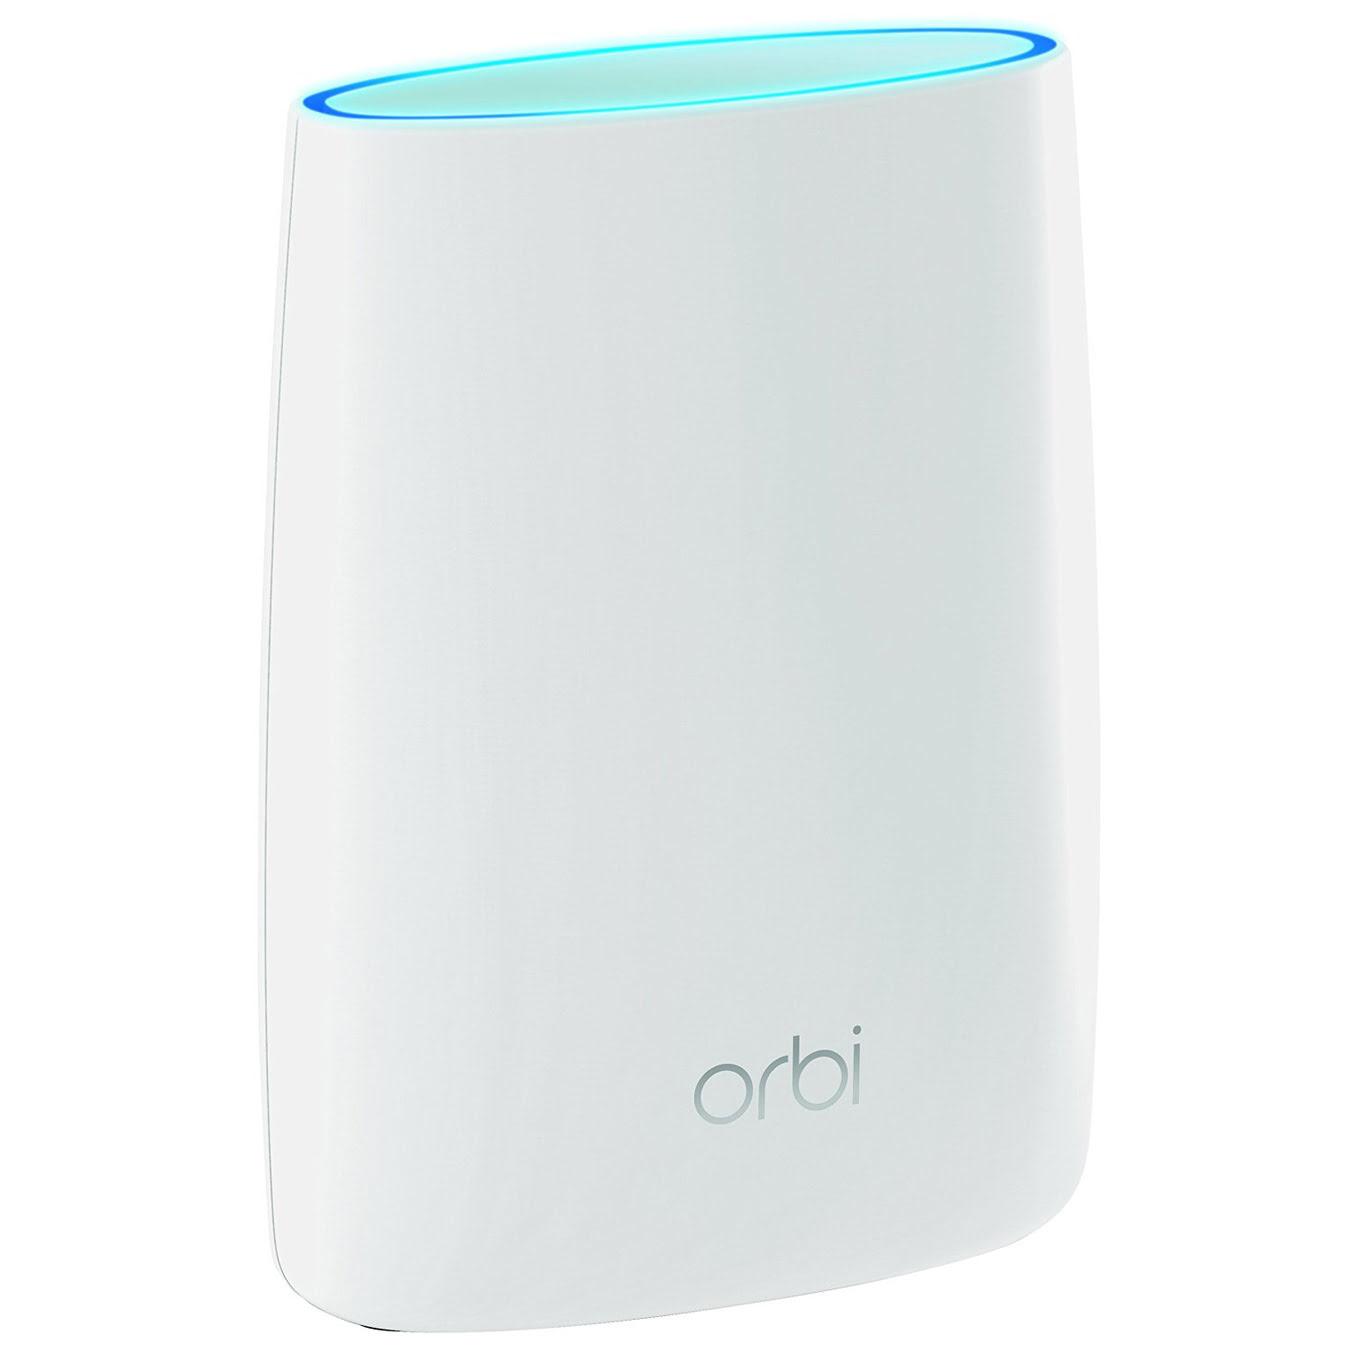 Orbi Système Wifi RBK50-100PES - AC3000 - Cybertek.fr - 2